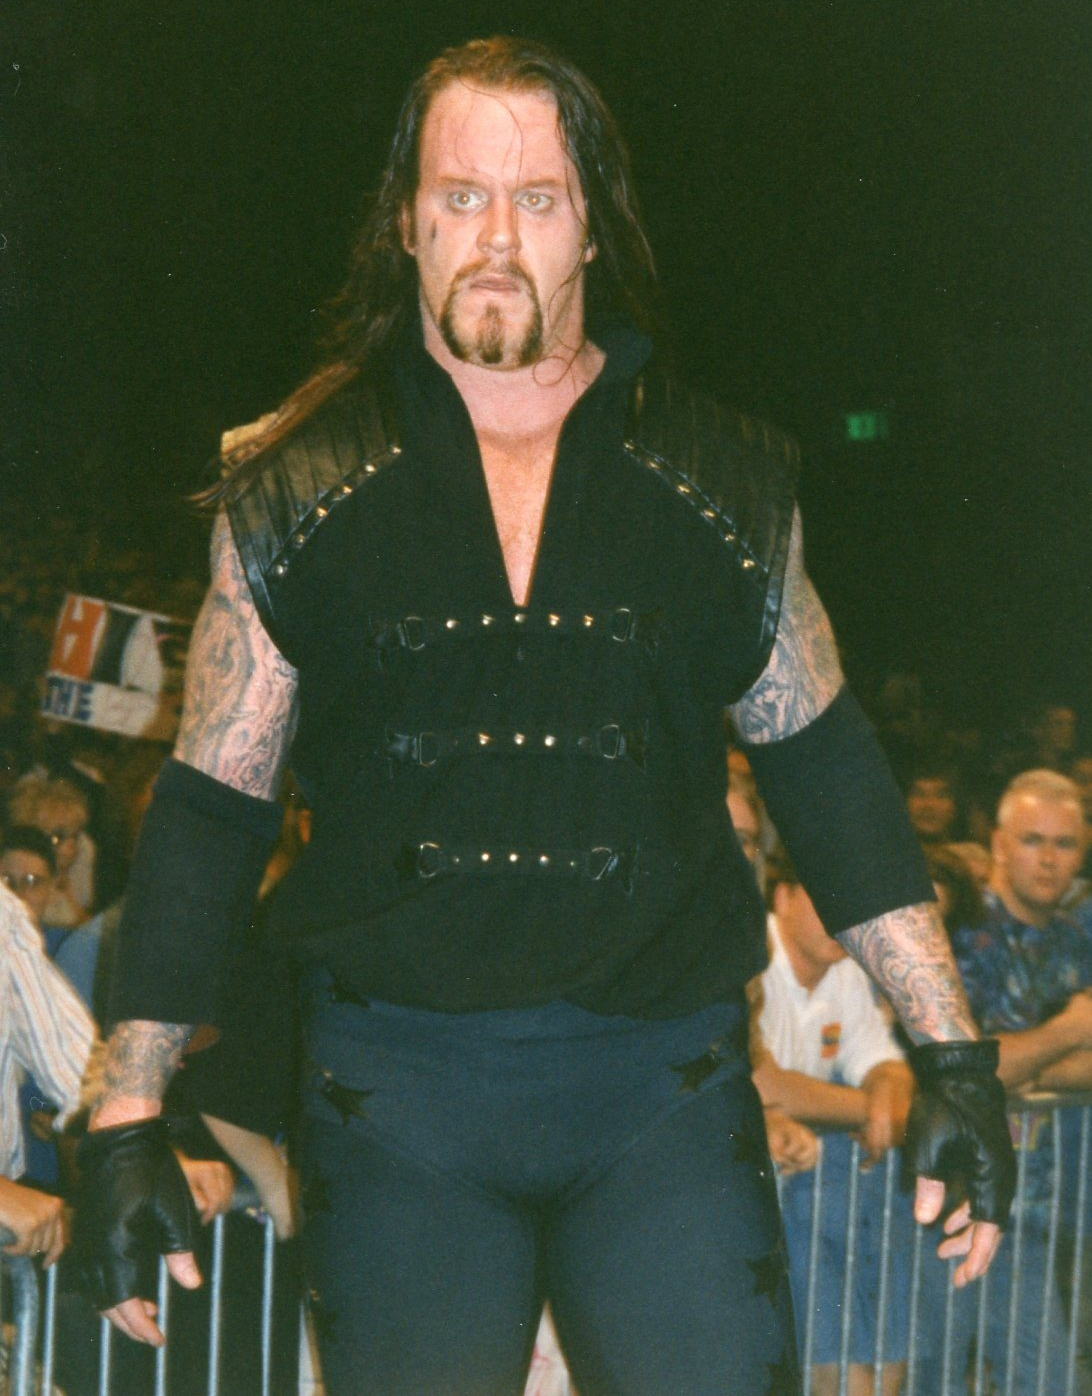 Wwe The Undertaker 1990s The undertaker in september 1997.